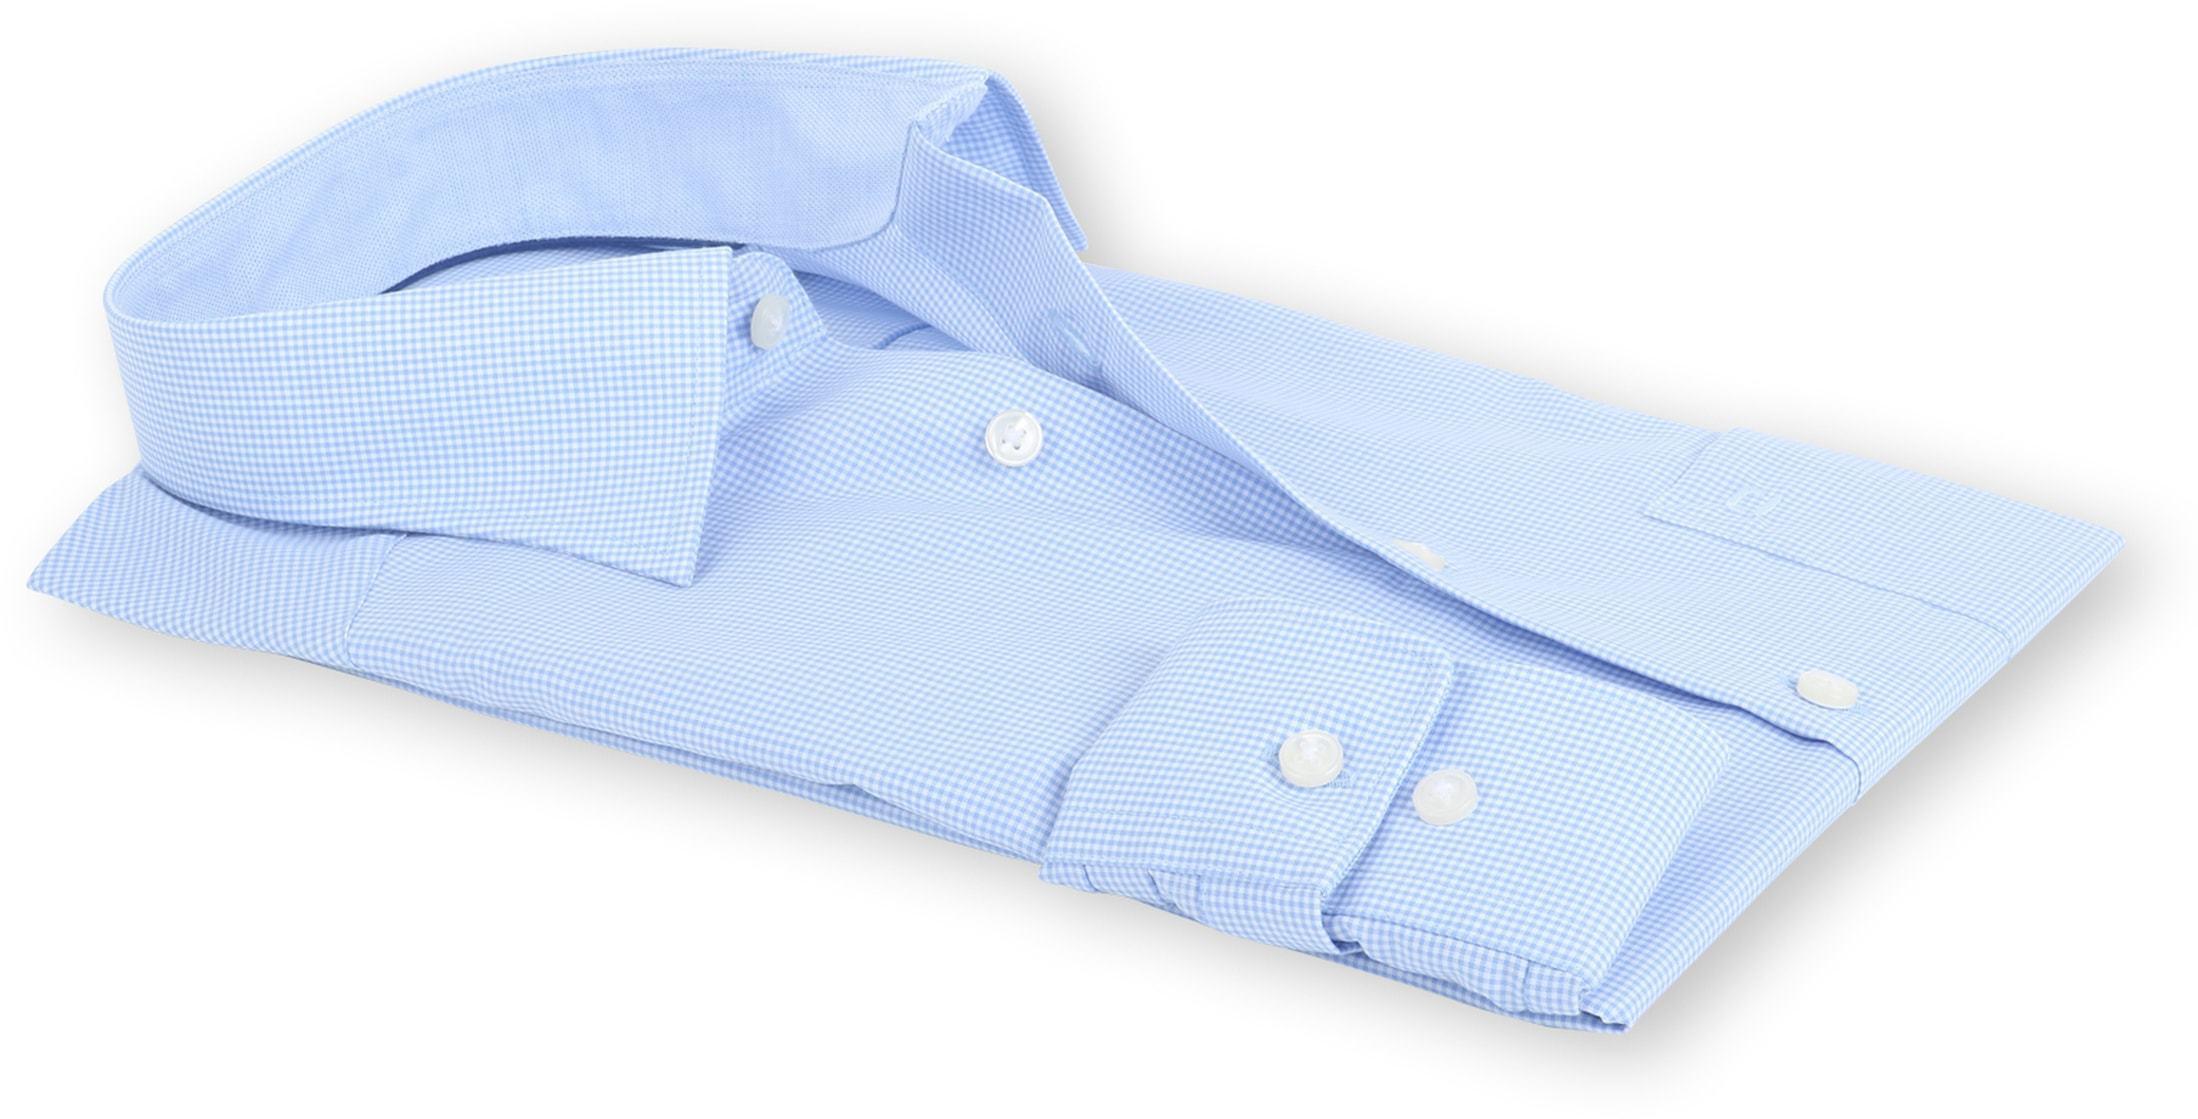 OLYMP Luxor Comfort Fit Shirt Blauw Ruit foto 3